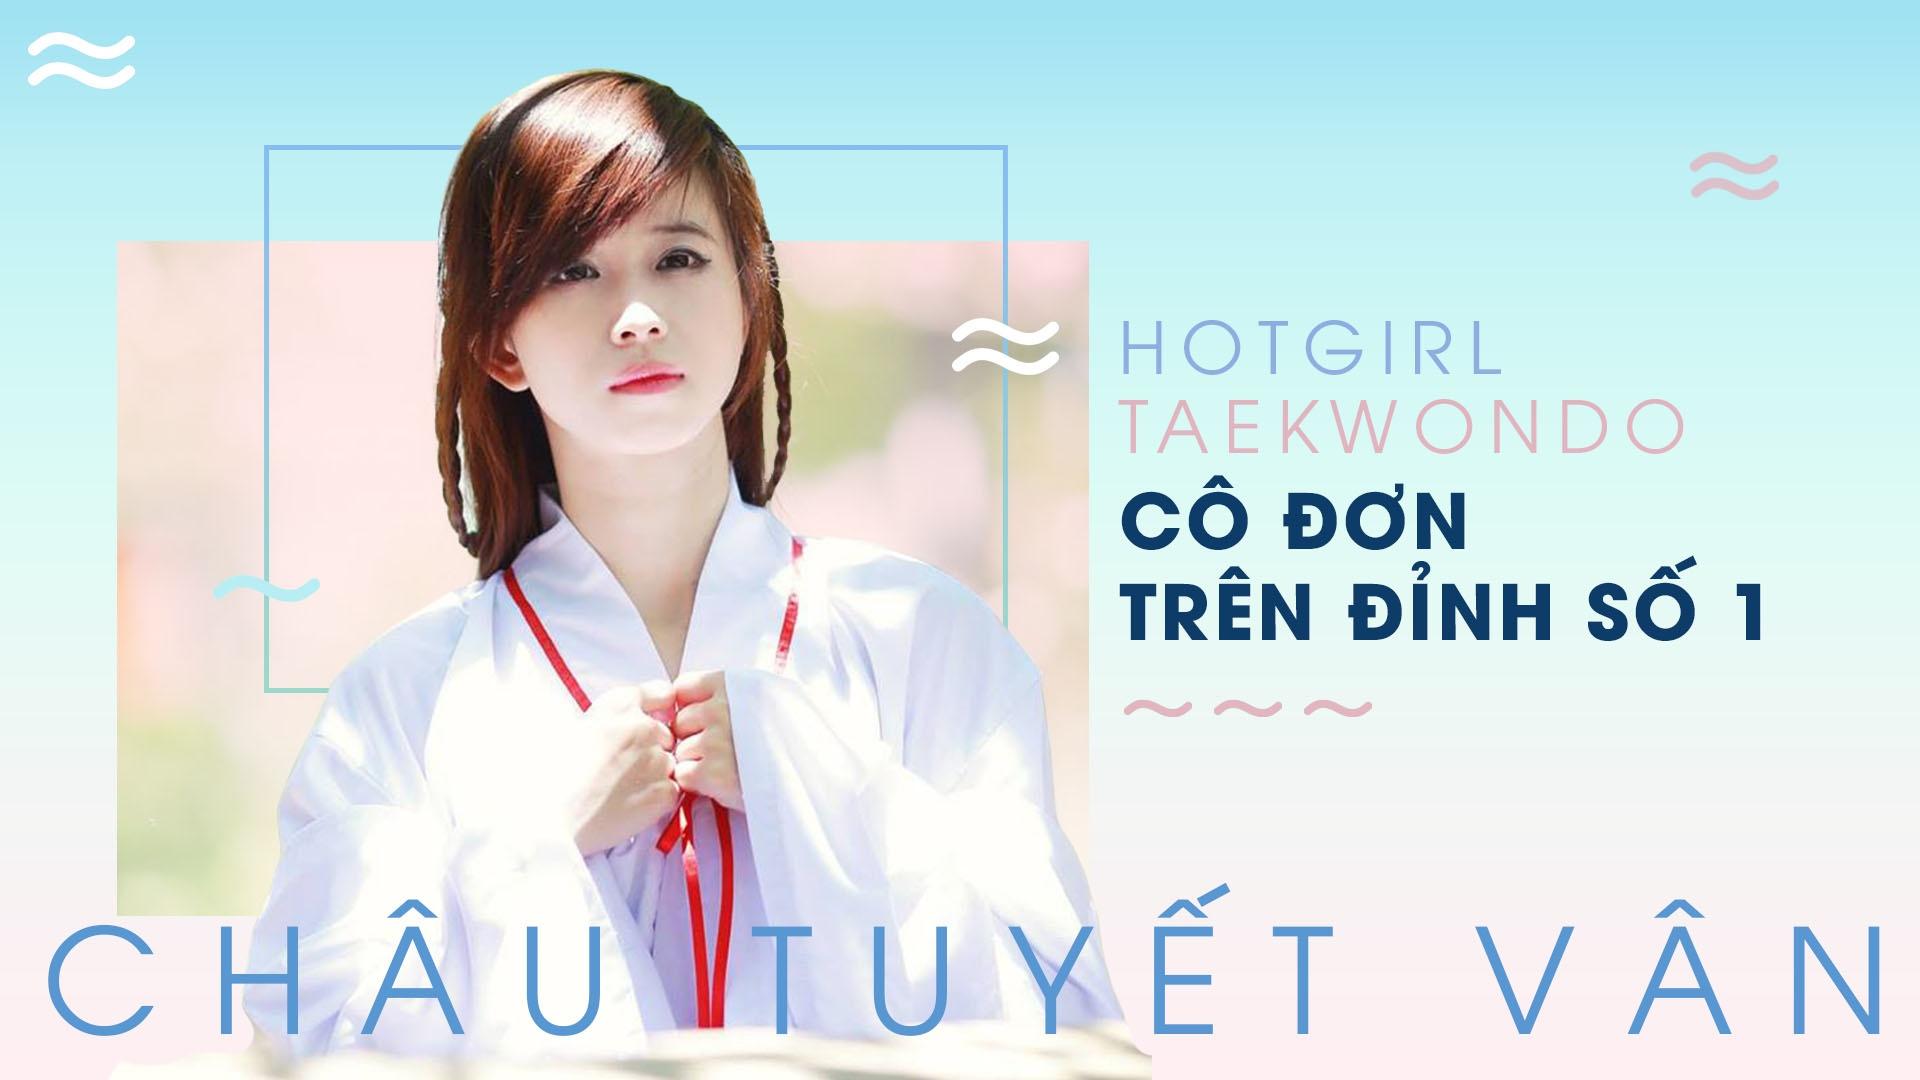 'Hot girl taekwondo' Chau Tuyet Van: Co don tren dinh so 1 hinh anh 1